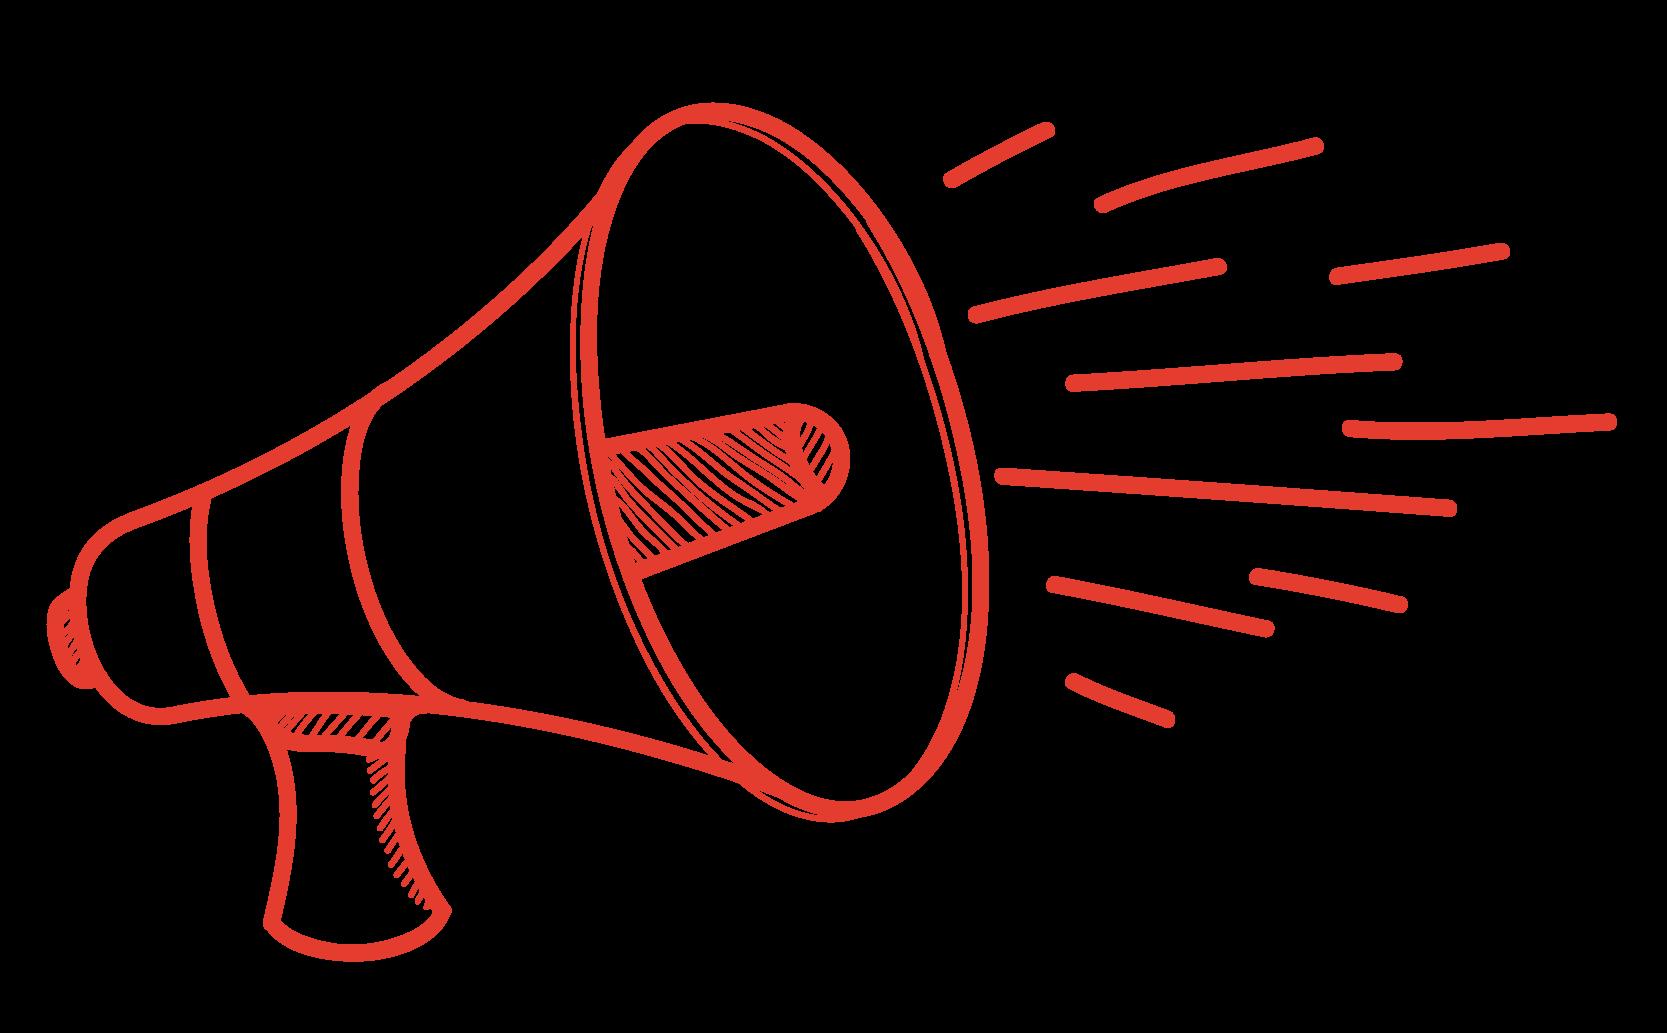 Red megaphone doodle